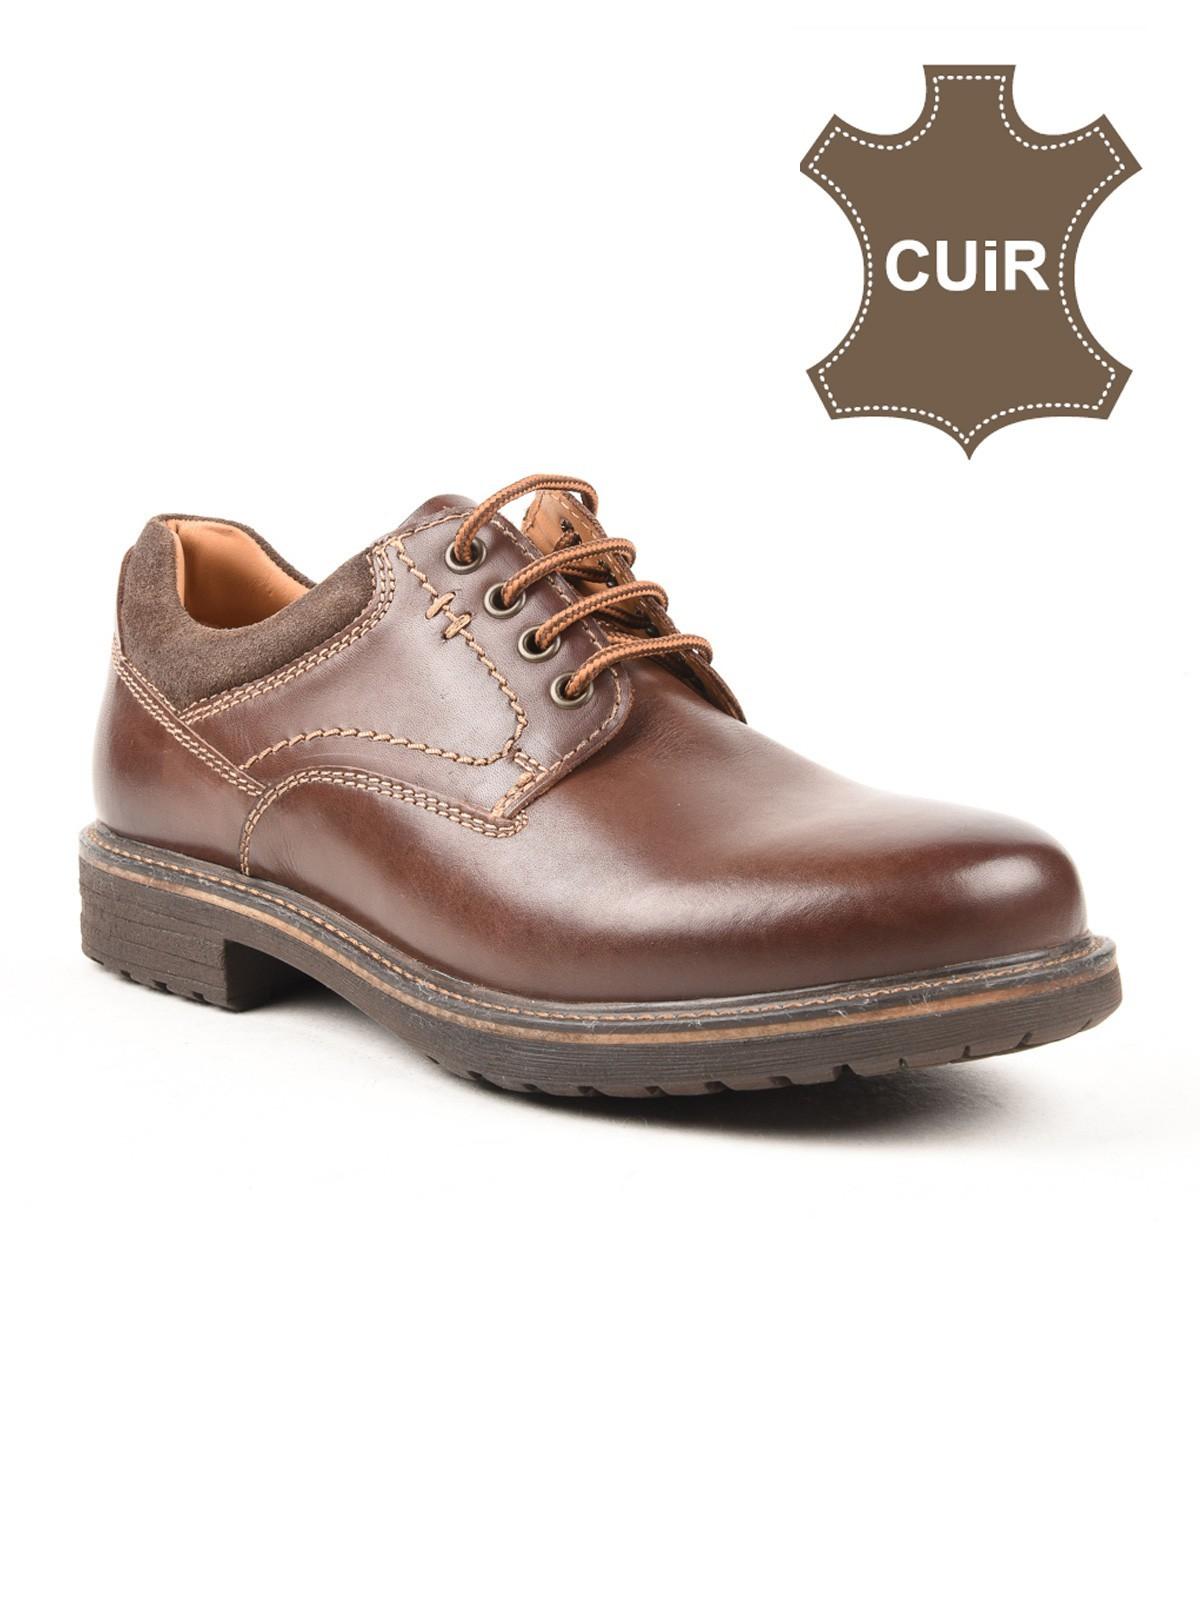 Districenter Homme Détente Chaussures Chaussures Cuir 7f6yIYbgmv